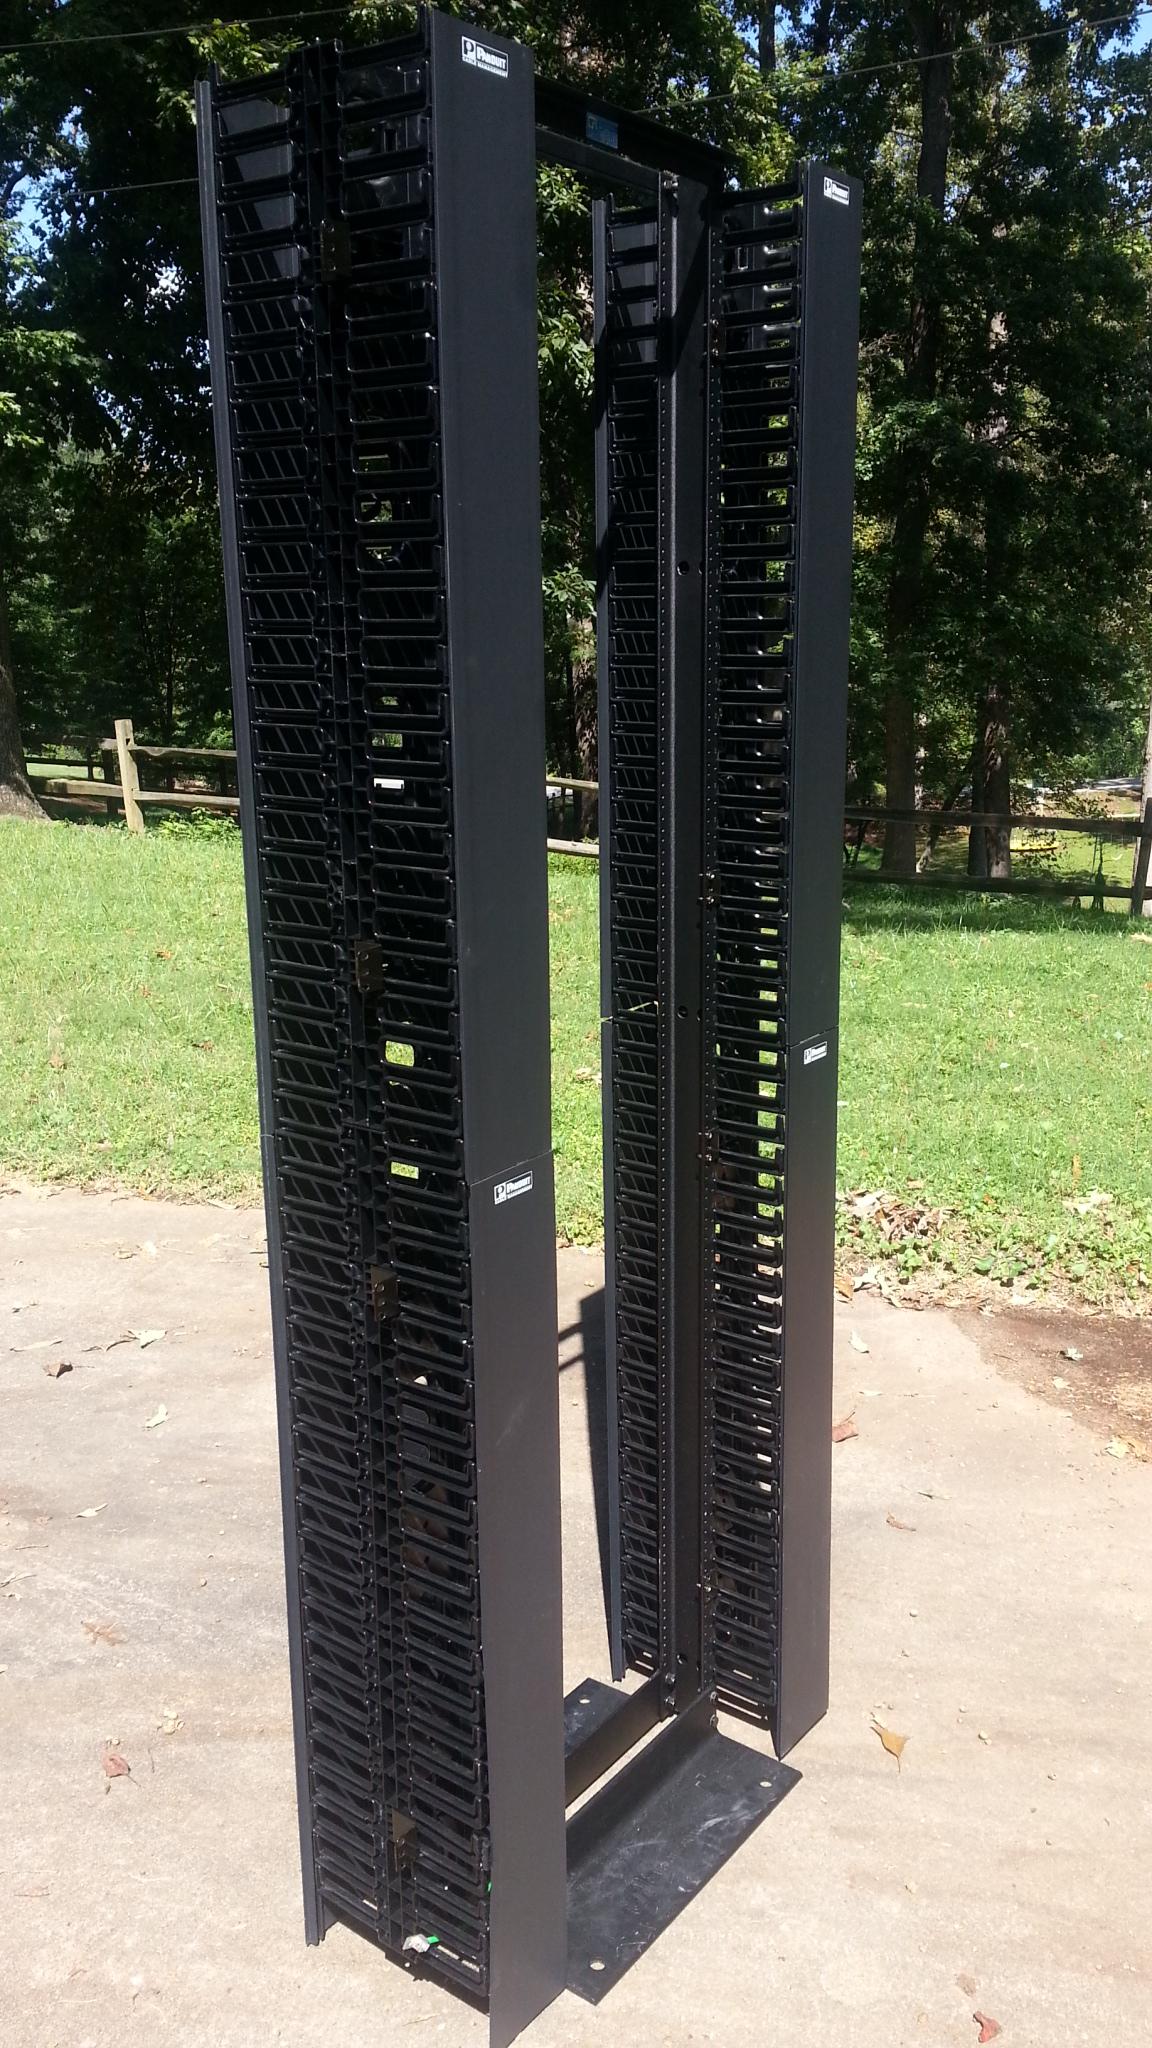 Wireless Classifieds Chatsworth Rack 7 2 Post Relay